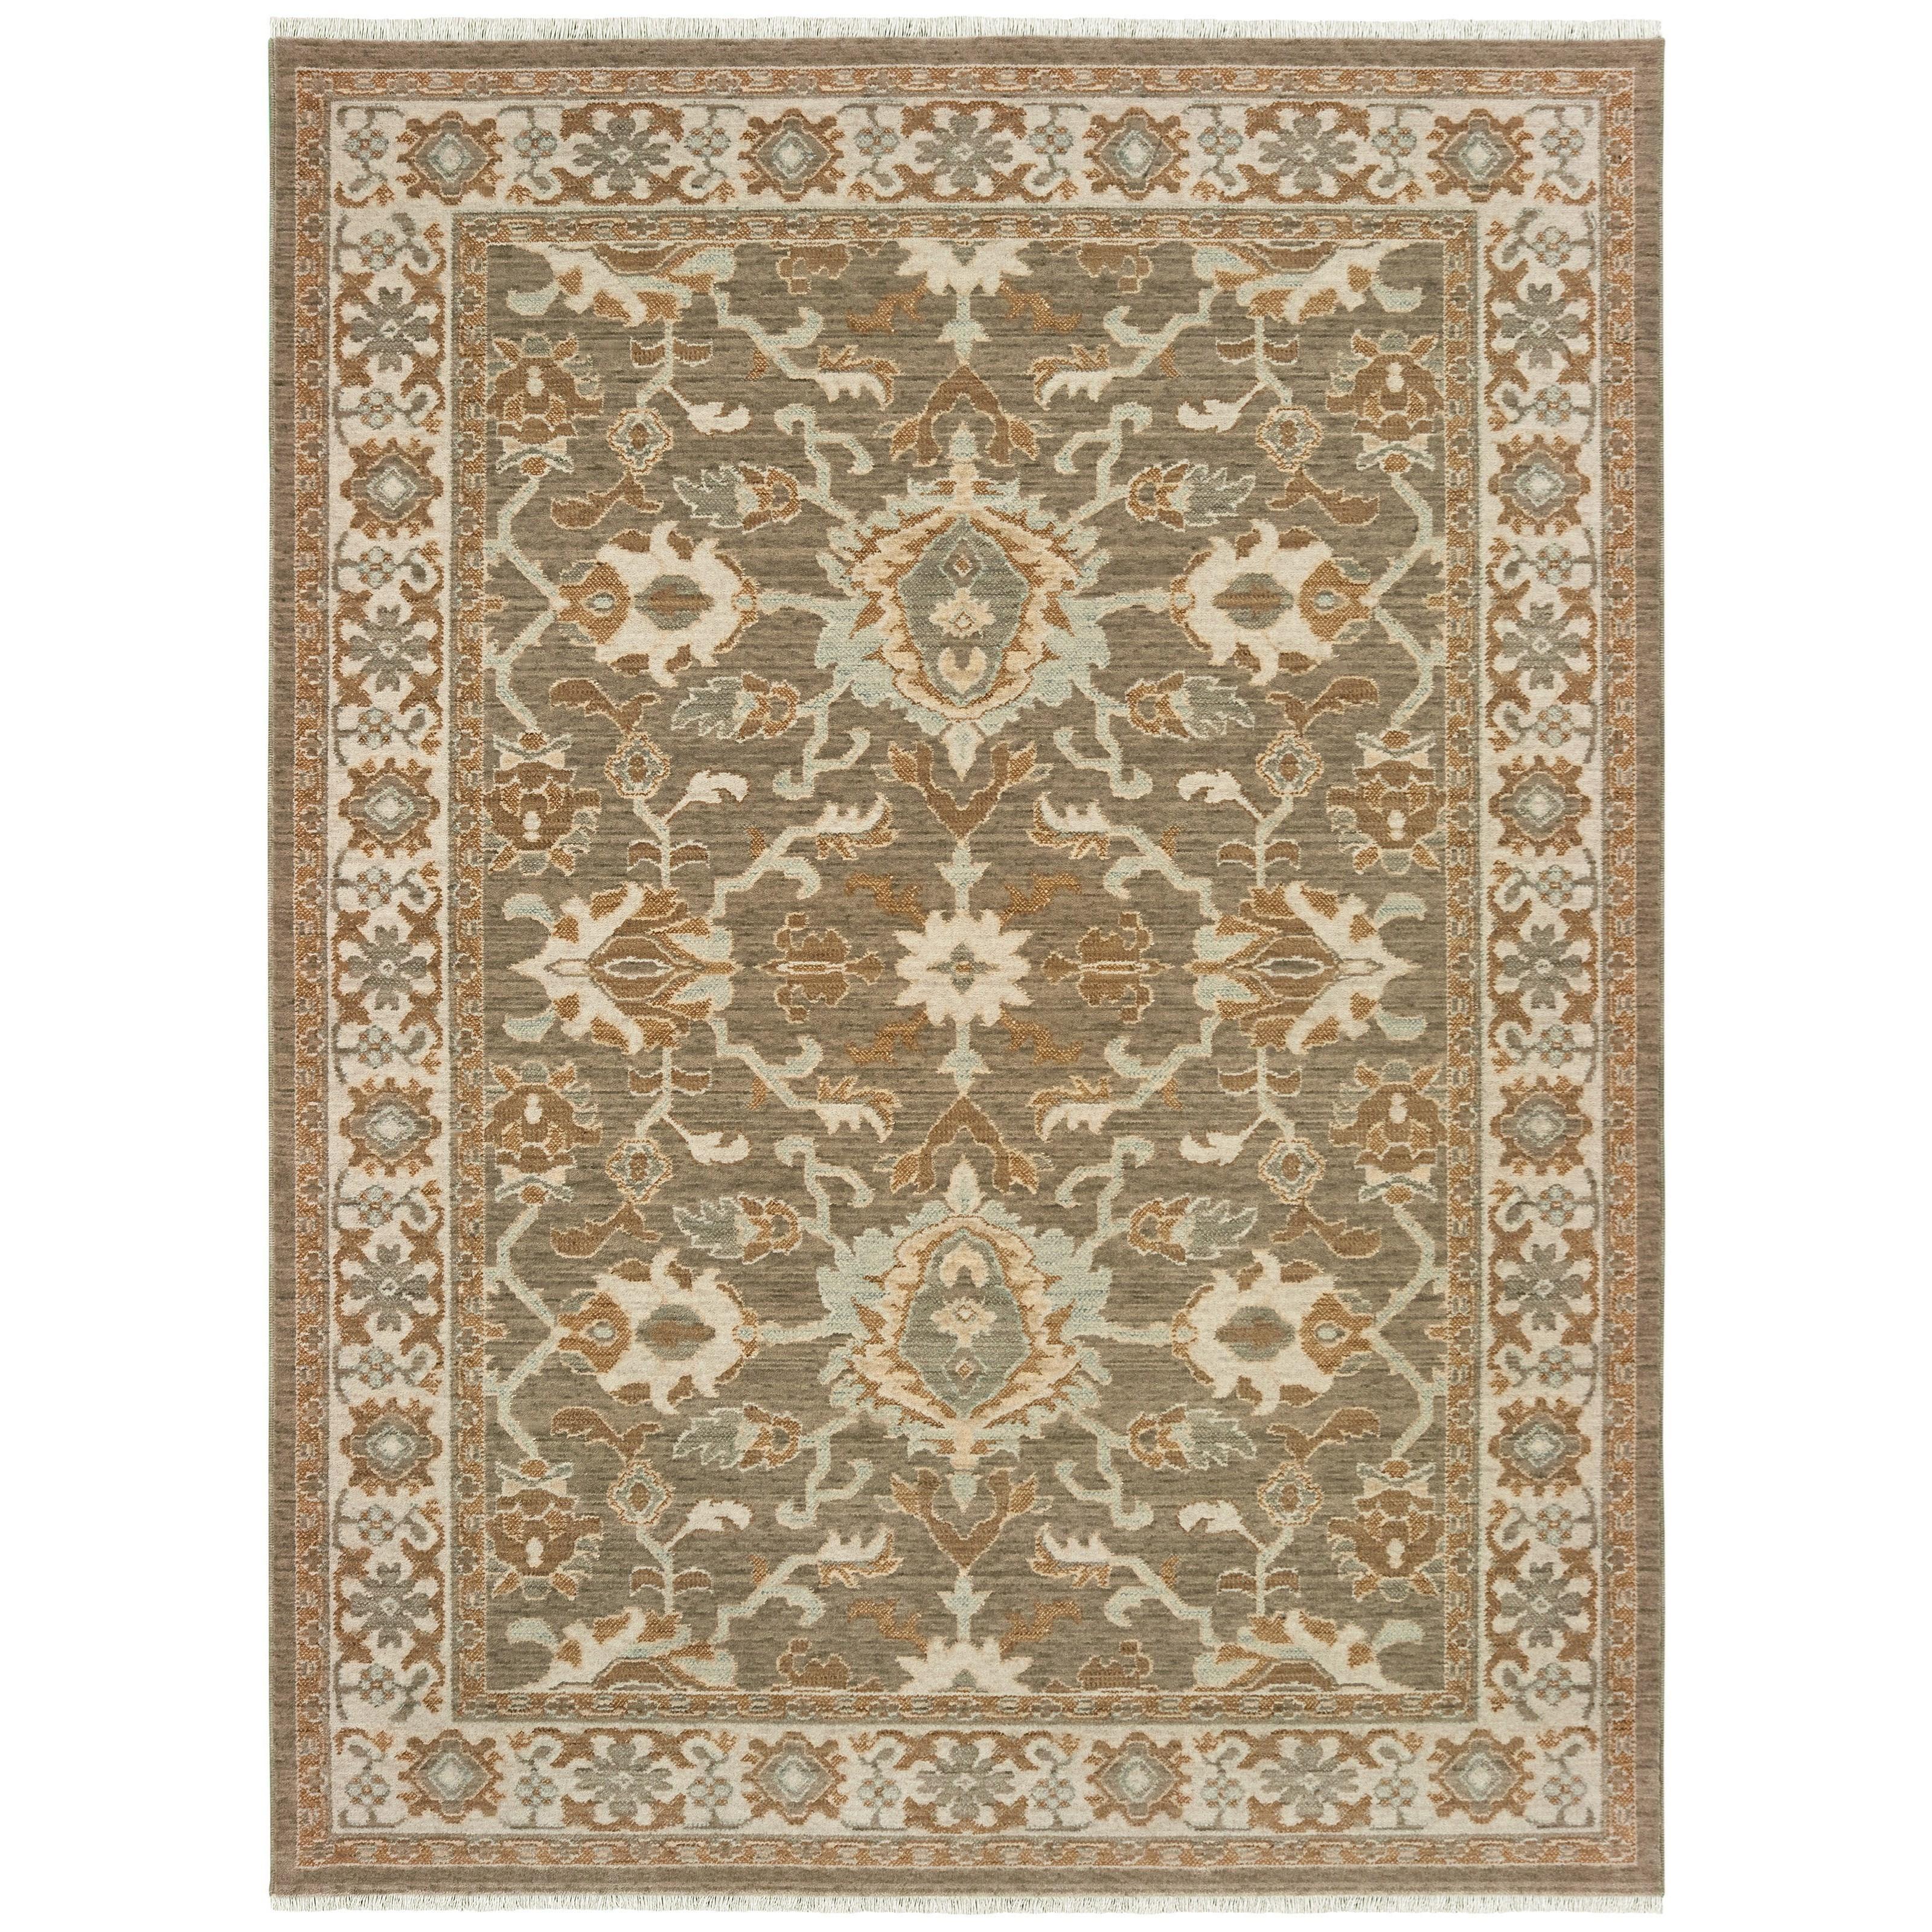 "Anatolia 3'10"" X  5' 5"" Rectangle Rug by Oriental Weavers at Novello Home Furnishings"